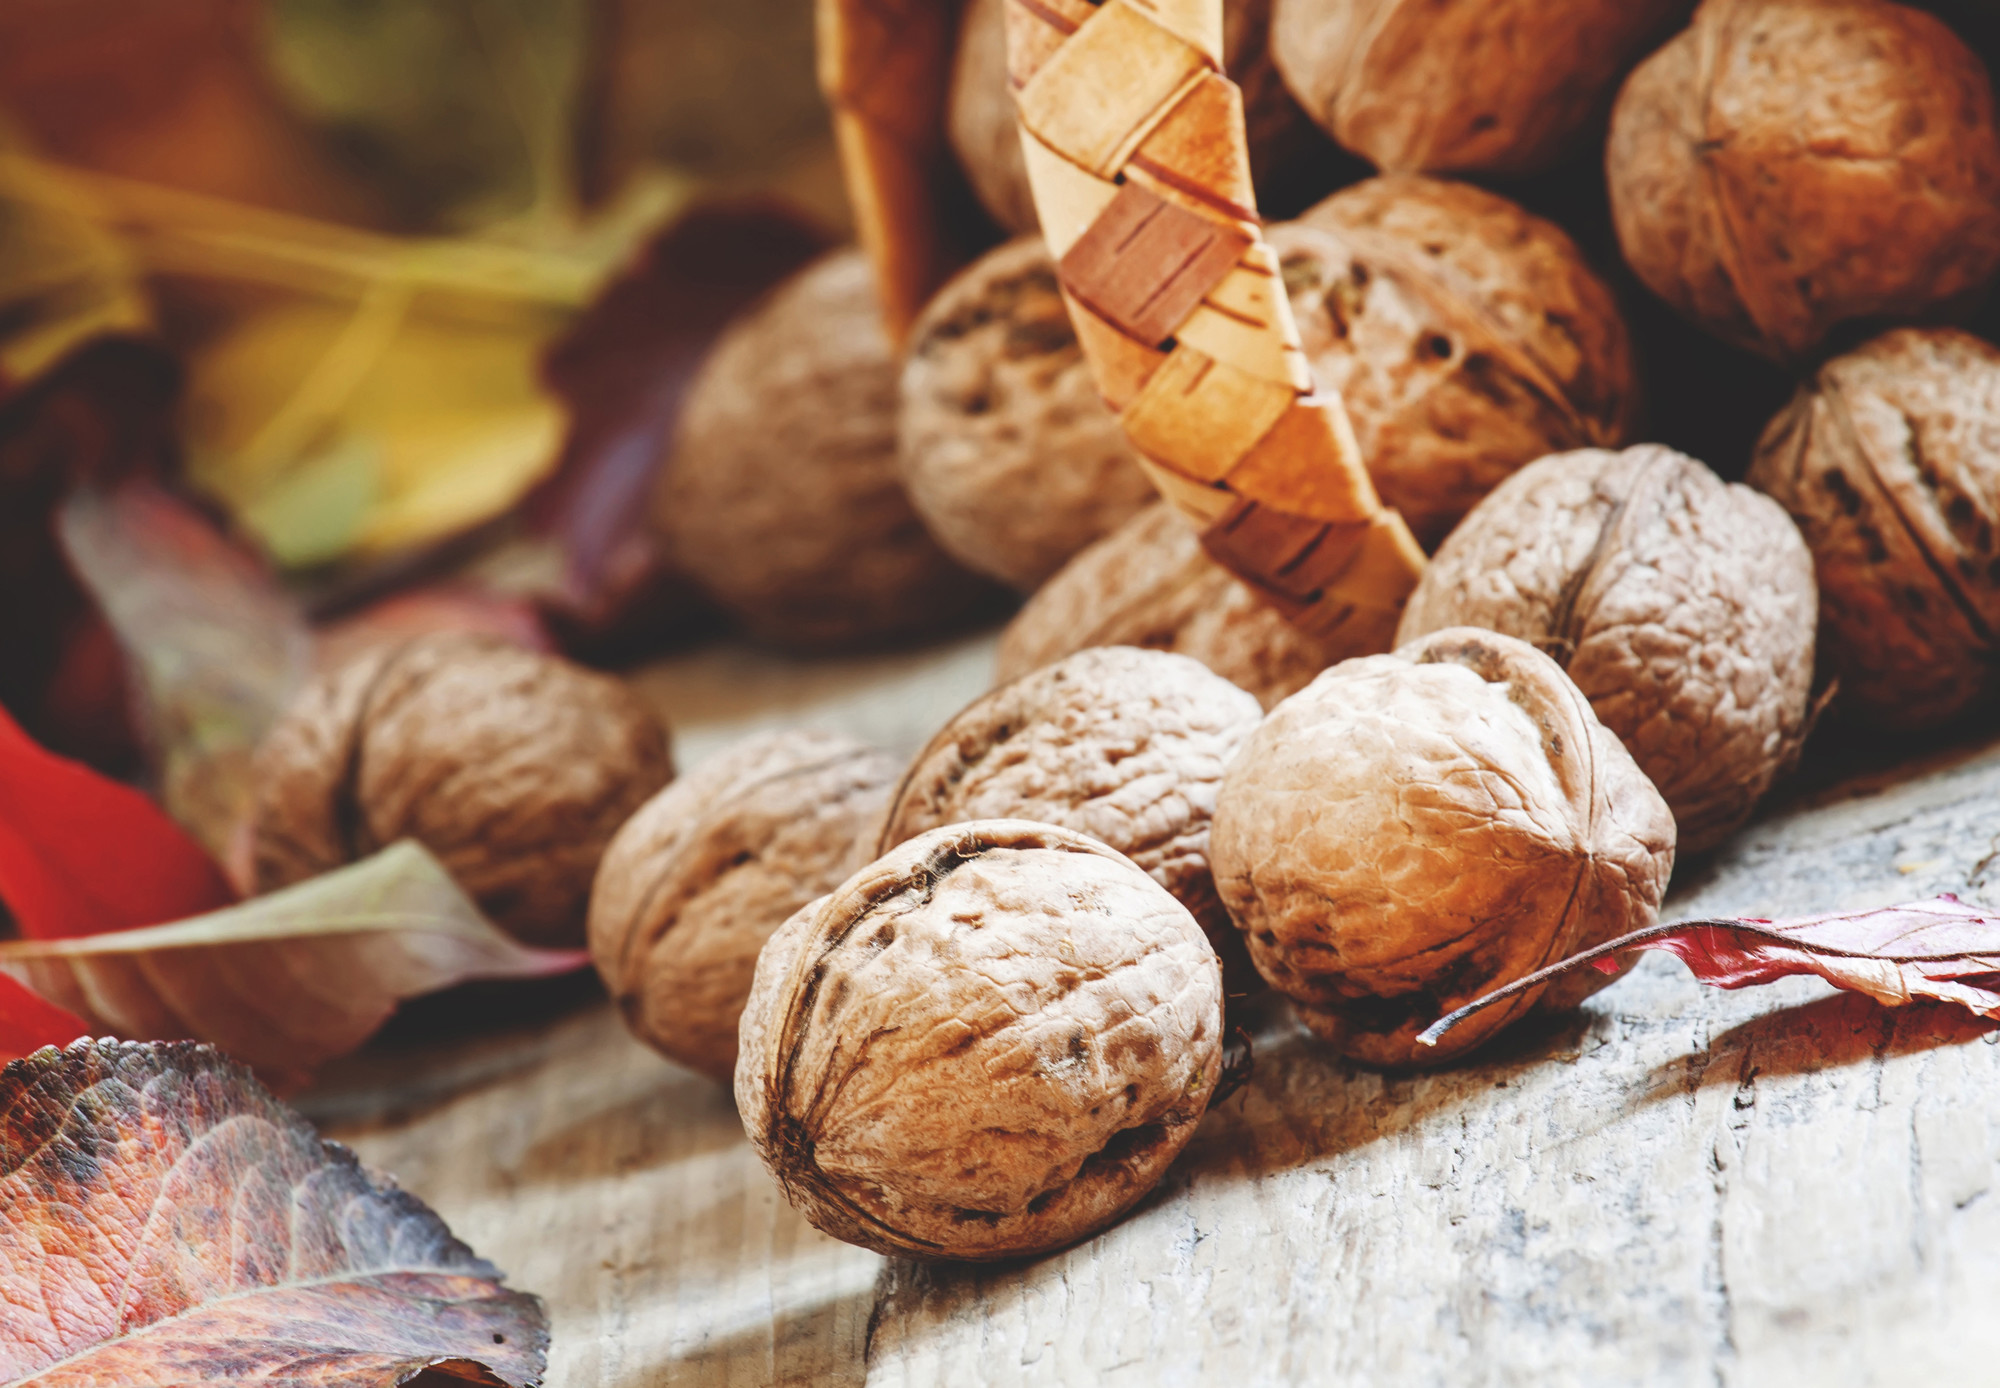 Грецкие орехи богаты антиоксидантами